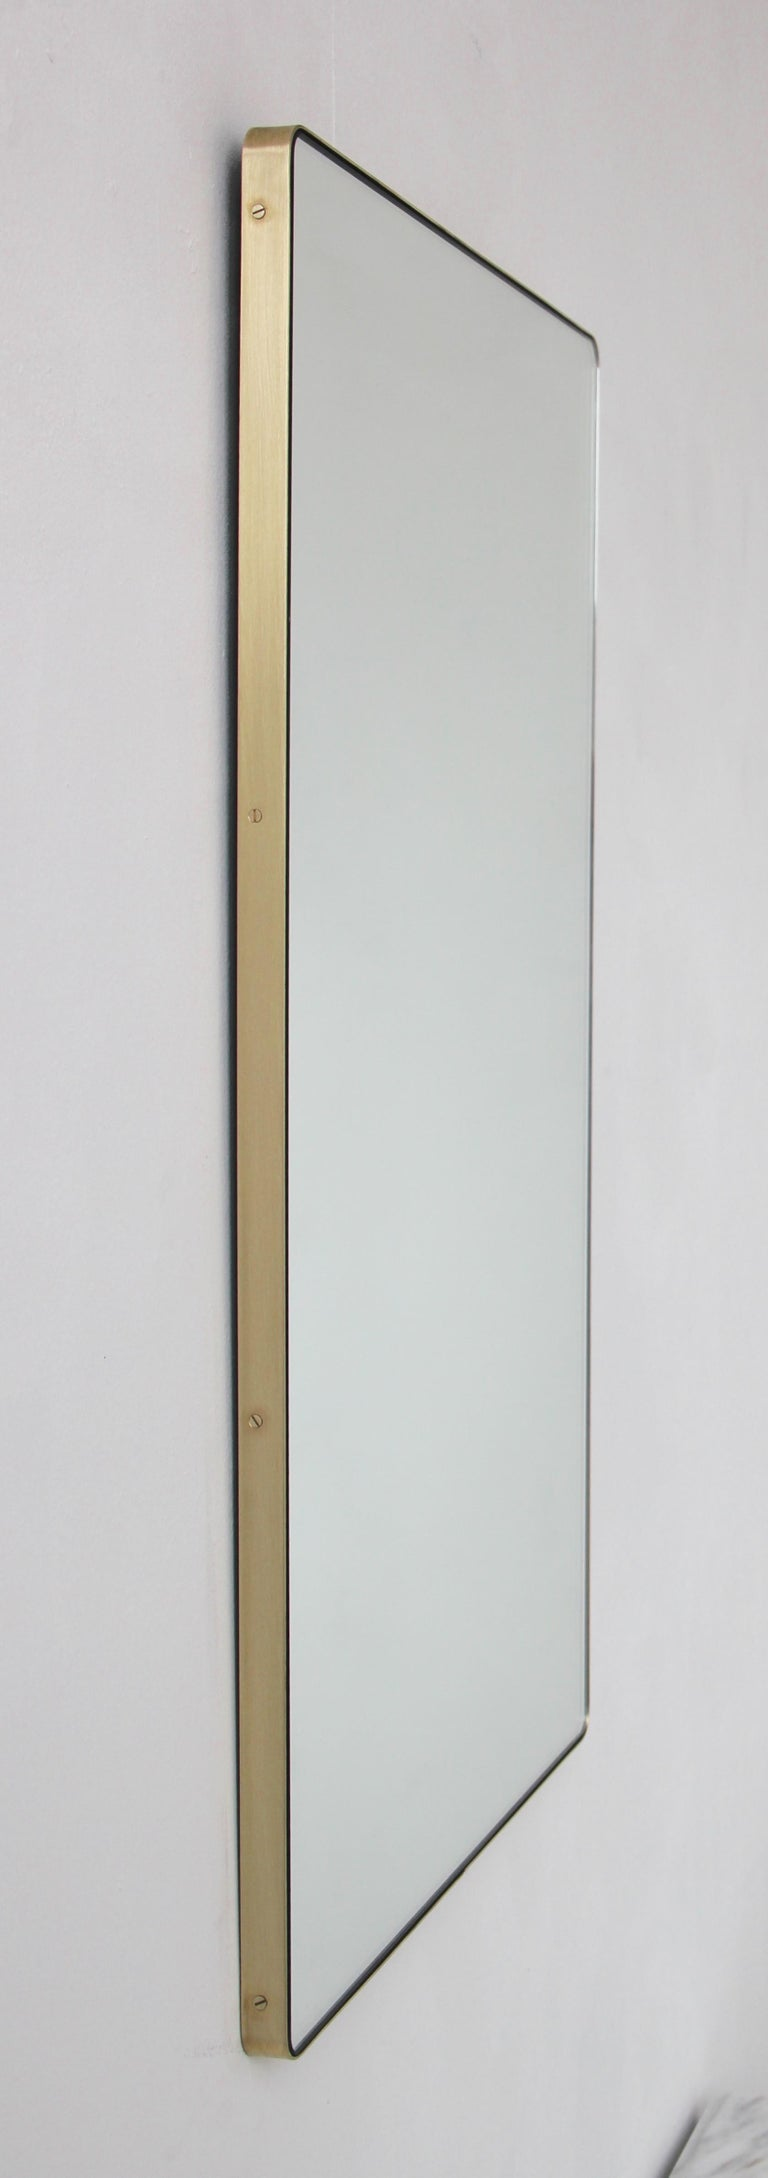 Organic Modern Quadris™ Rectangular Modern Mirror with Brass Frame